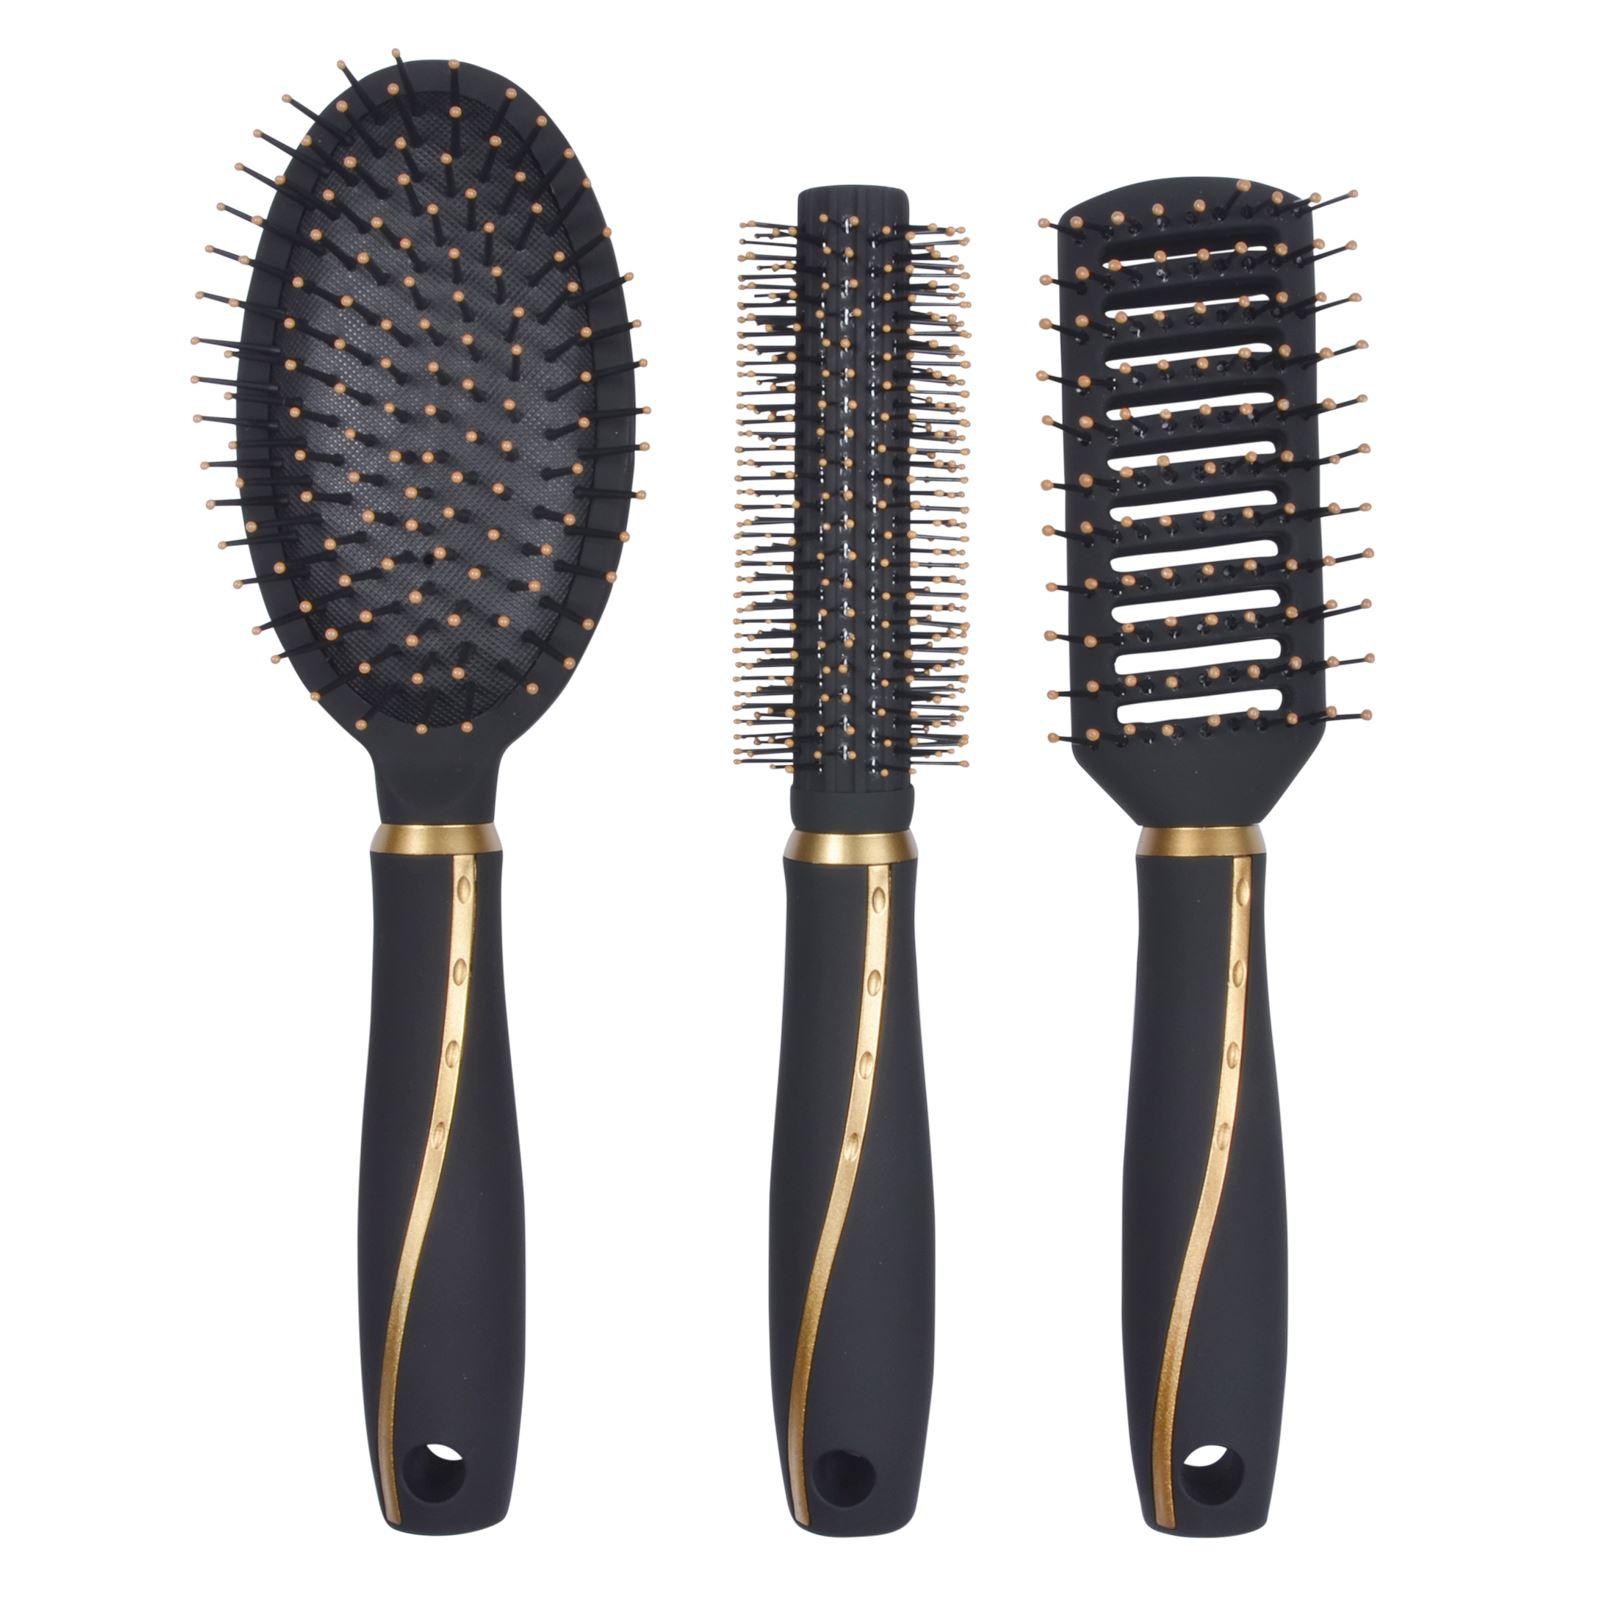 3Pc Professional Hair Brush Set Salon High Quality